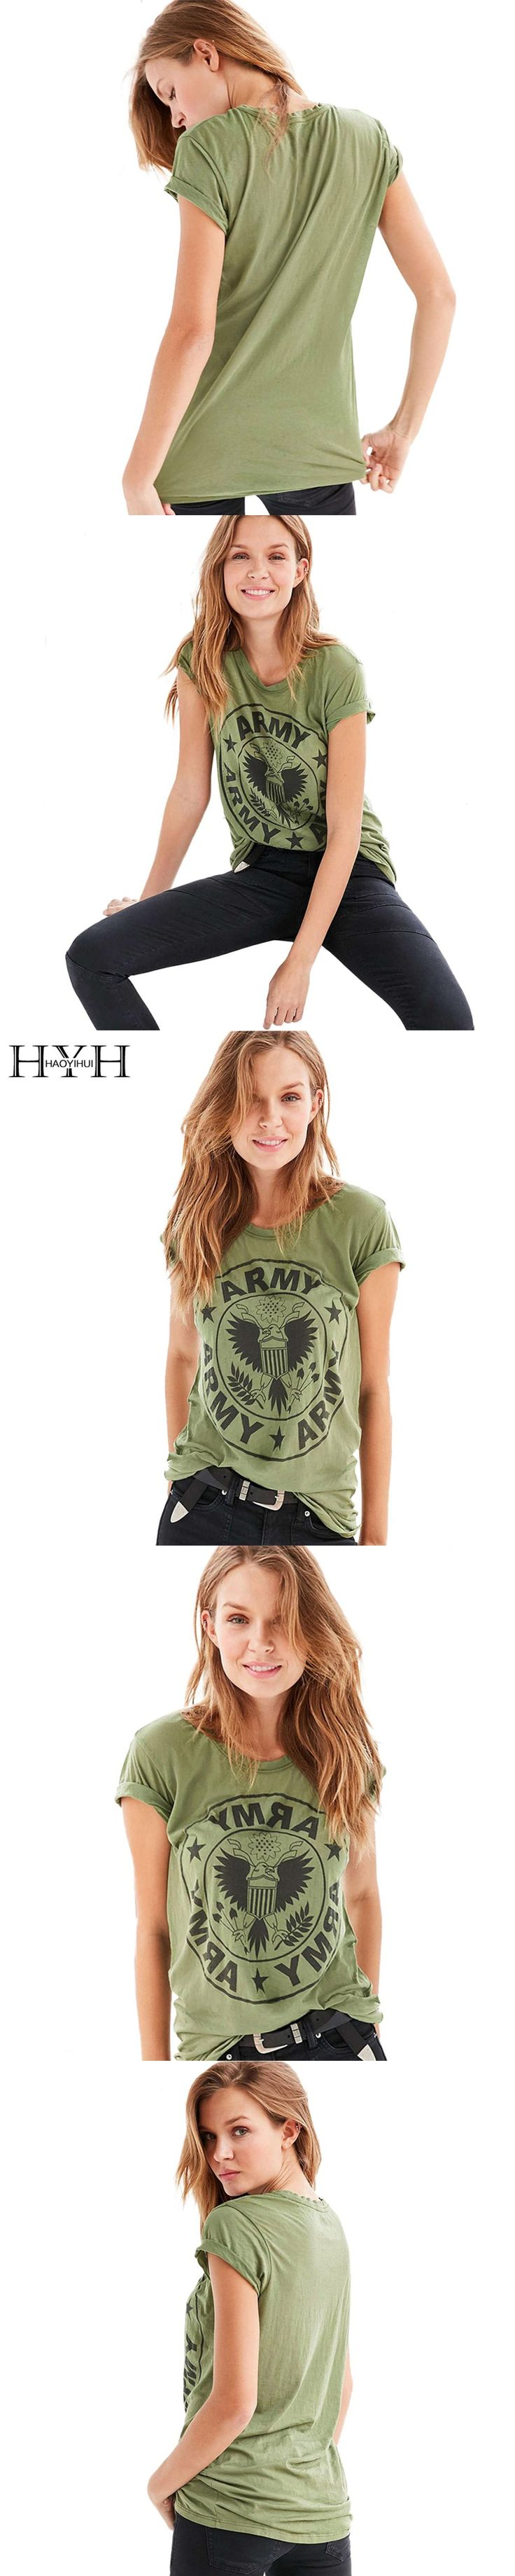 HYH HAOYIHUI Army Green Women T-Shirt O-Neck Loose Letter Print Tees Casual Streetwear Brief Short Sleeves T-Shirt